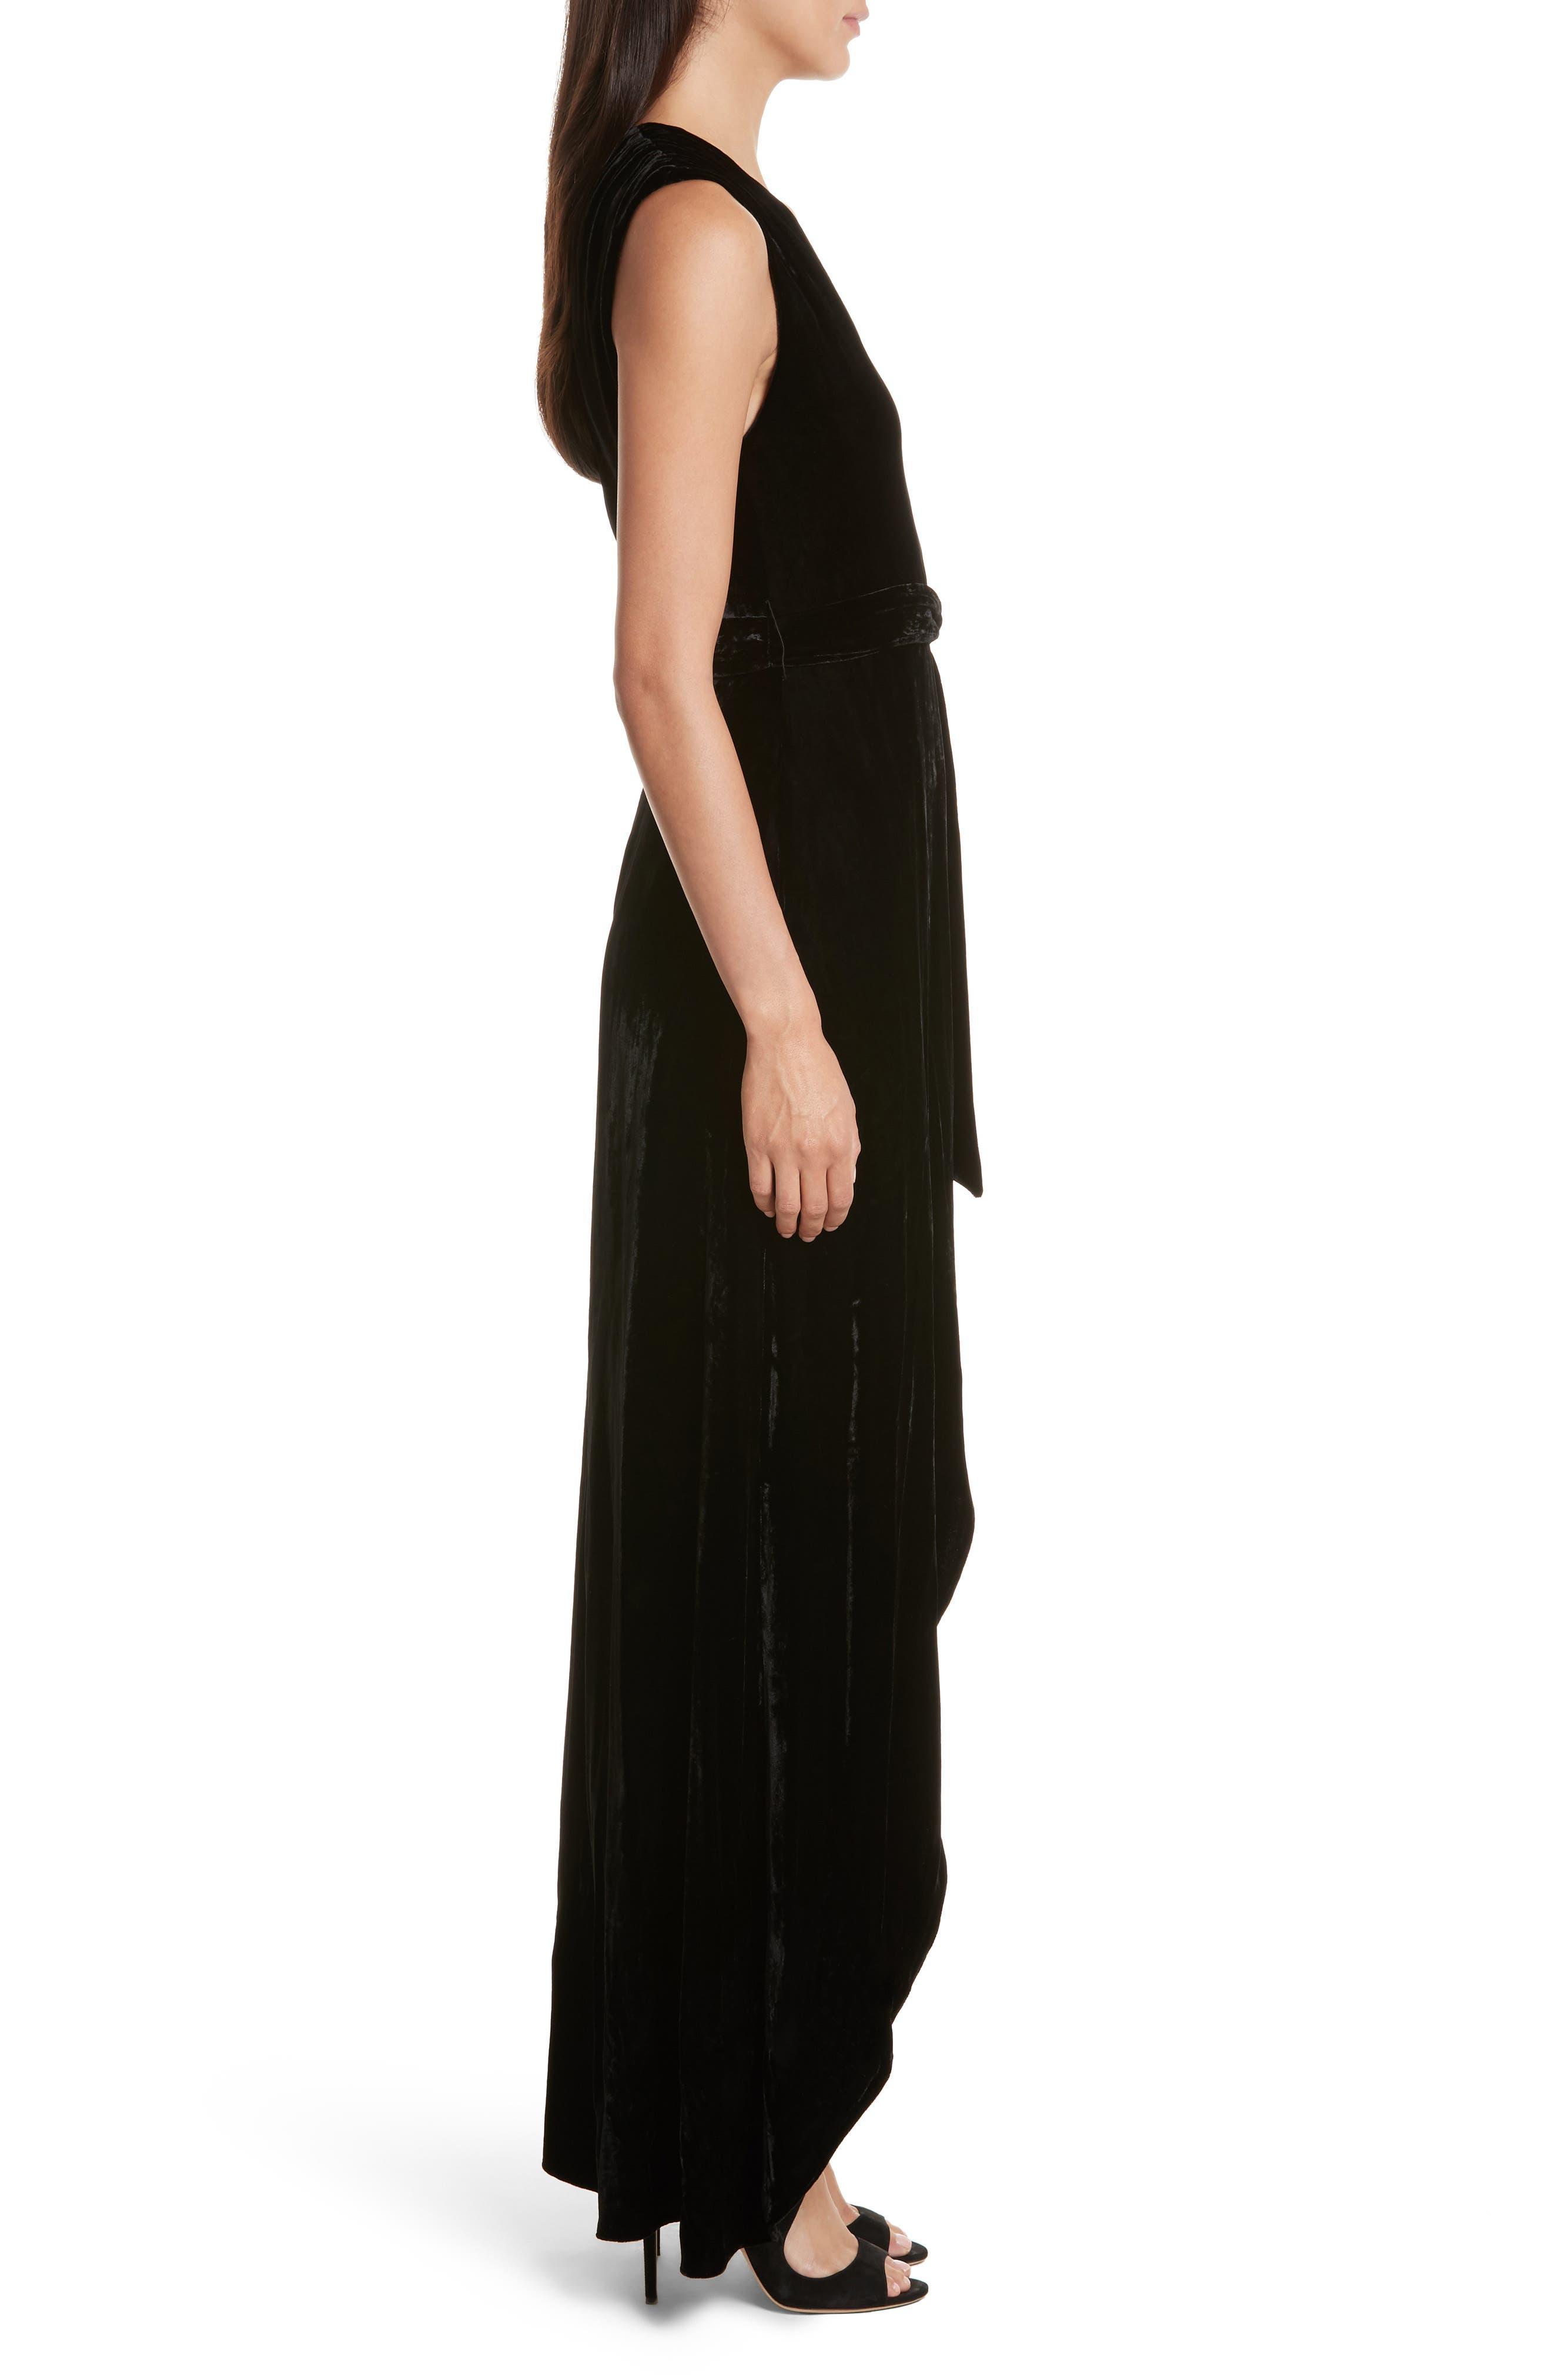 Simmons Velvet Wrap Maxi Dress,                             Alternate thumbnail 3, color,                             001